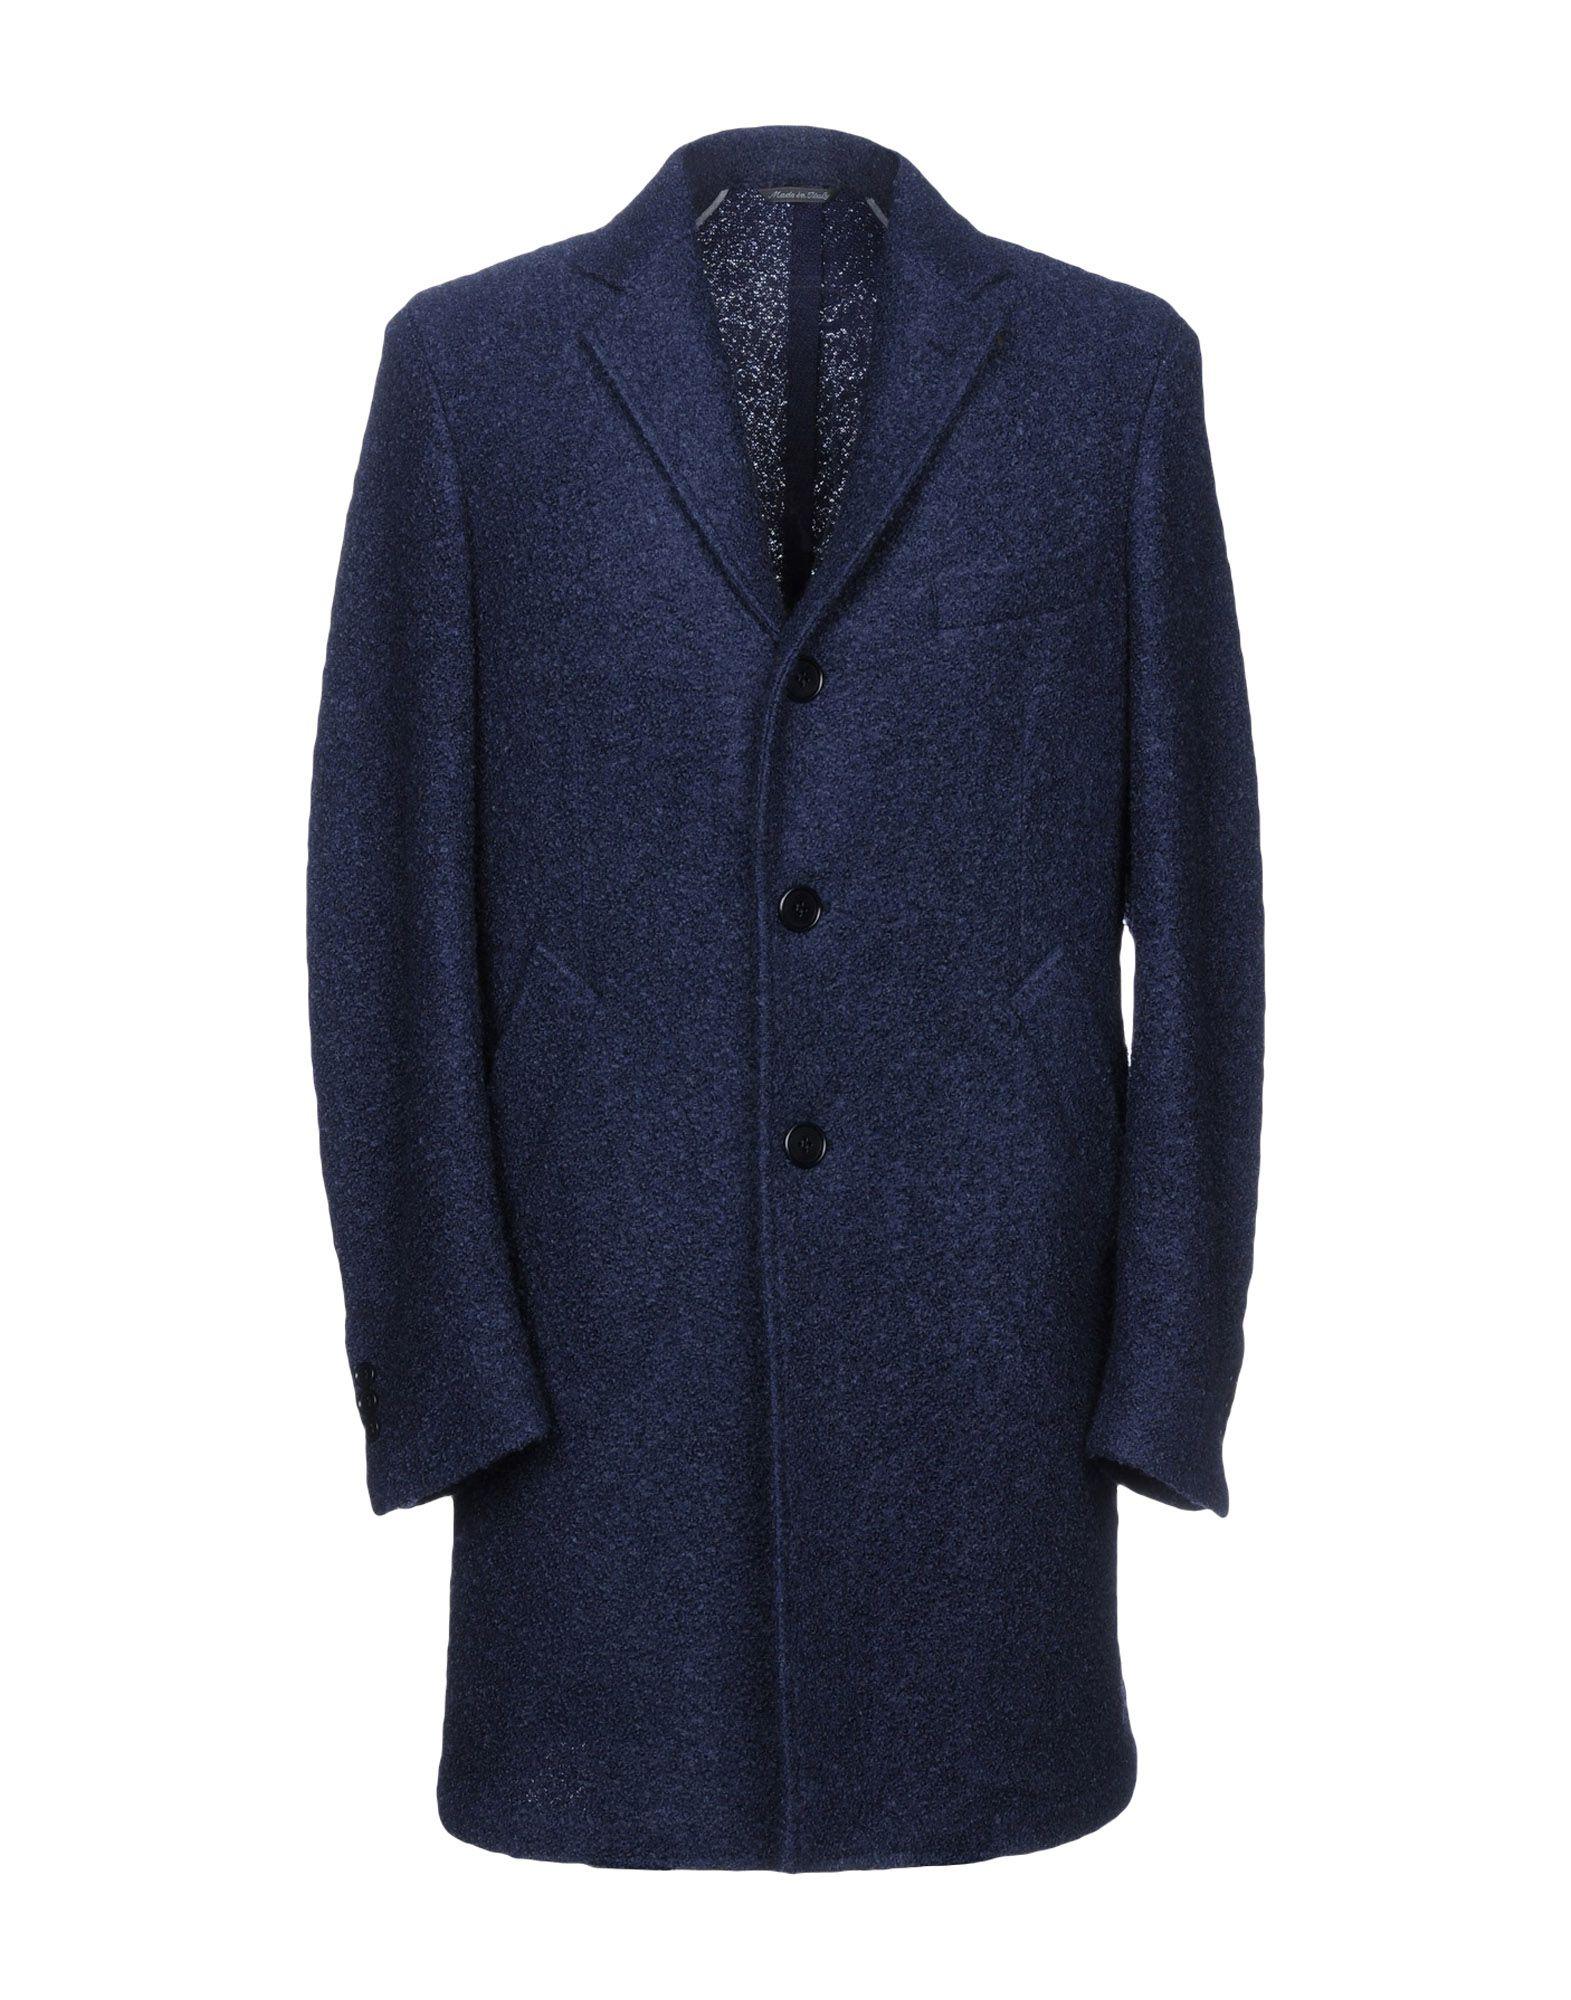 TOMBOLINI Coat in Dark Blue